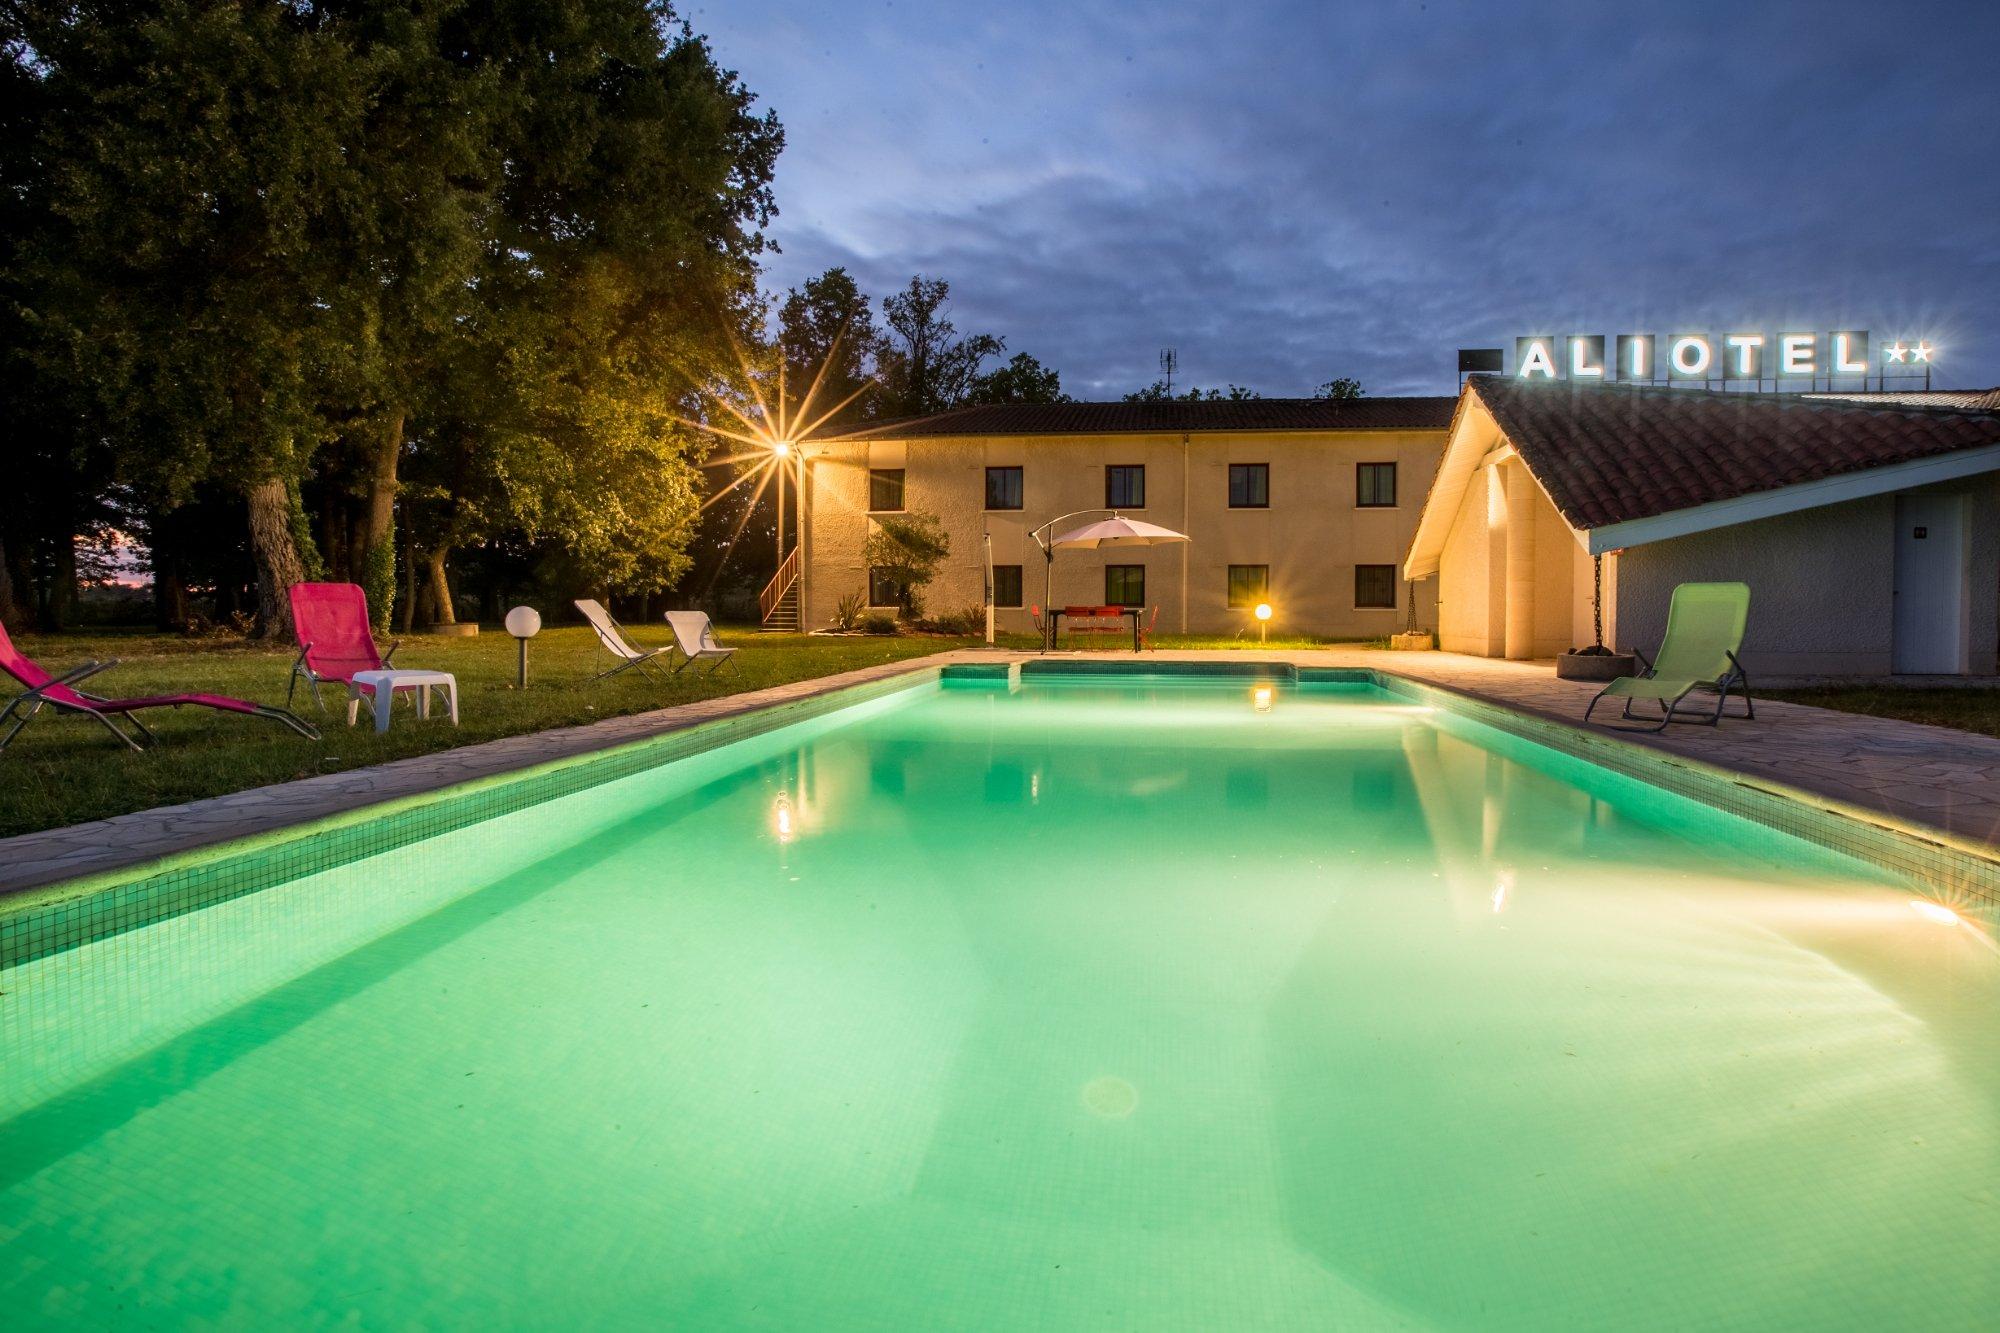 Hotel Aliotel